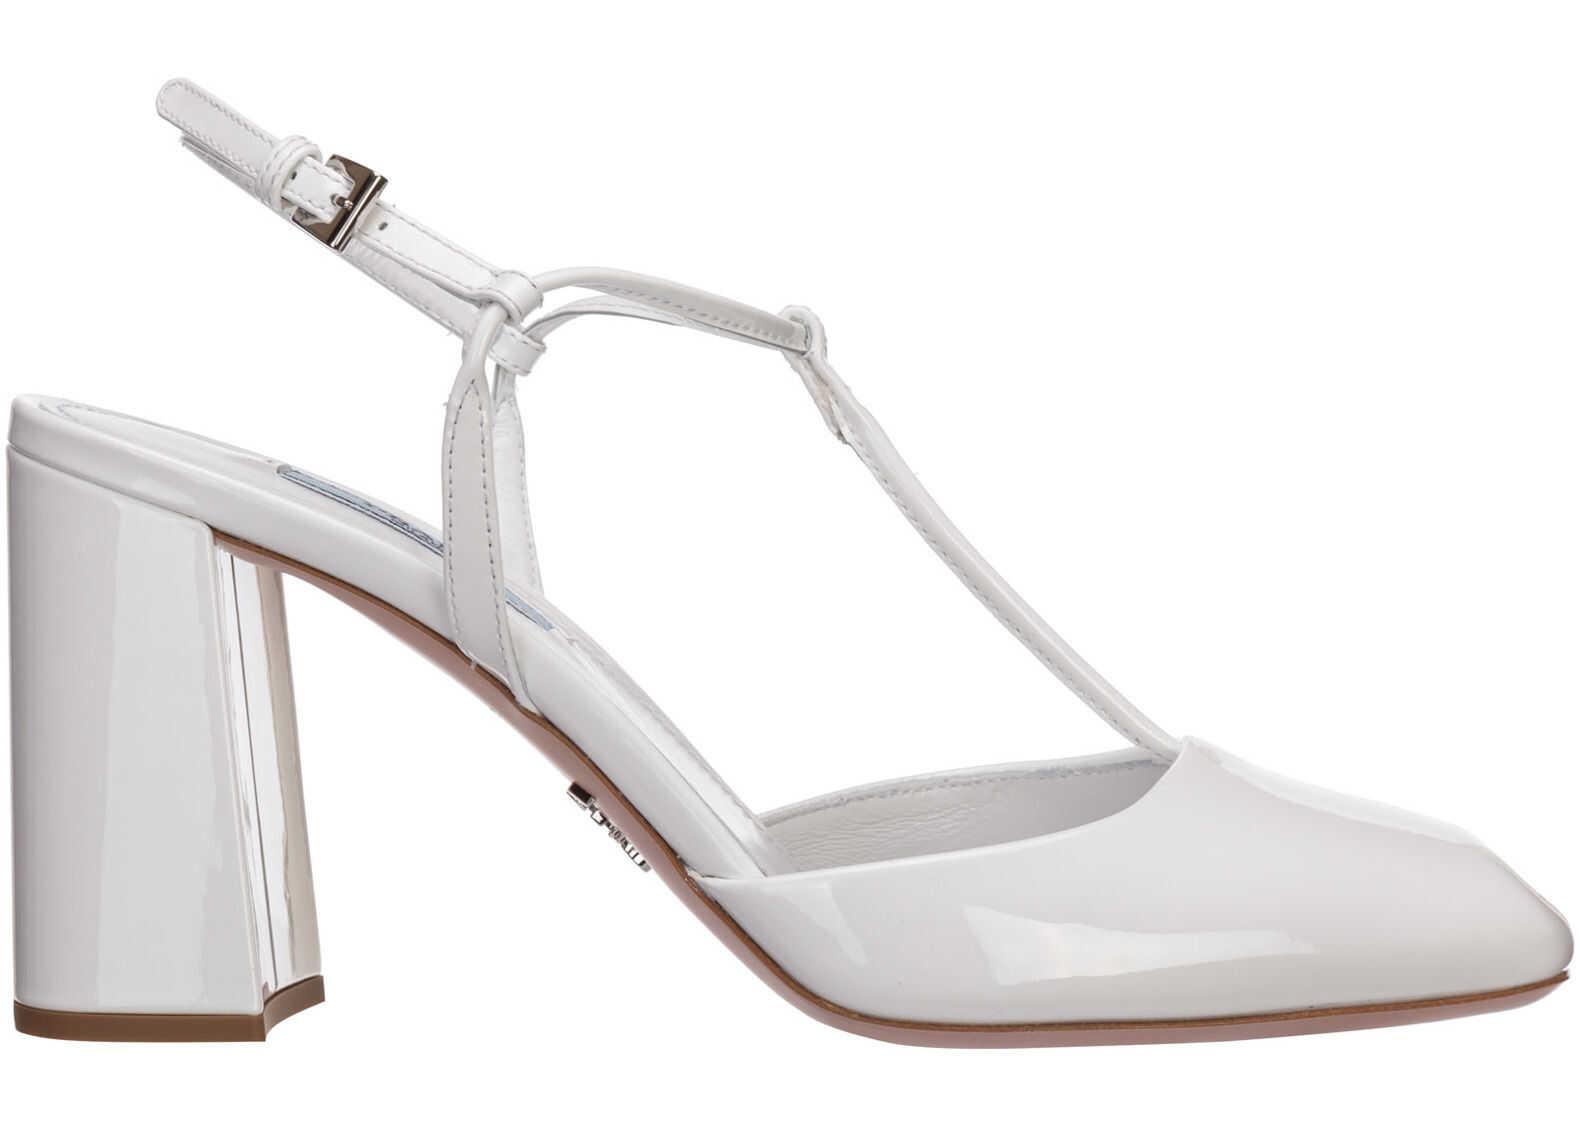 Prada High Heel White